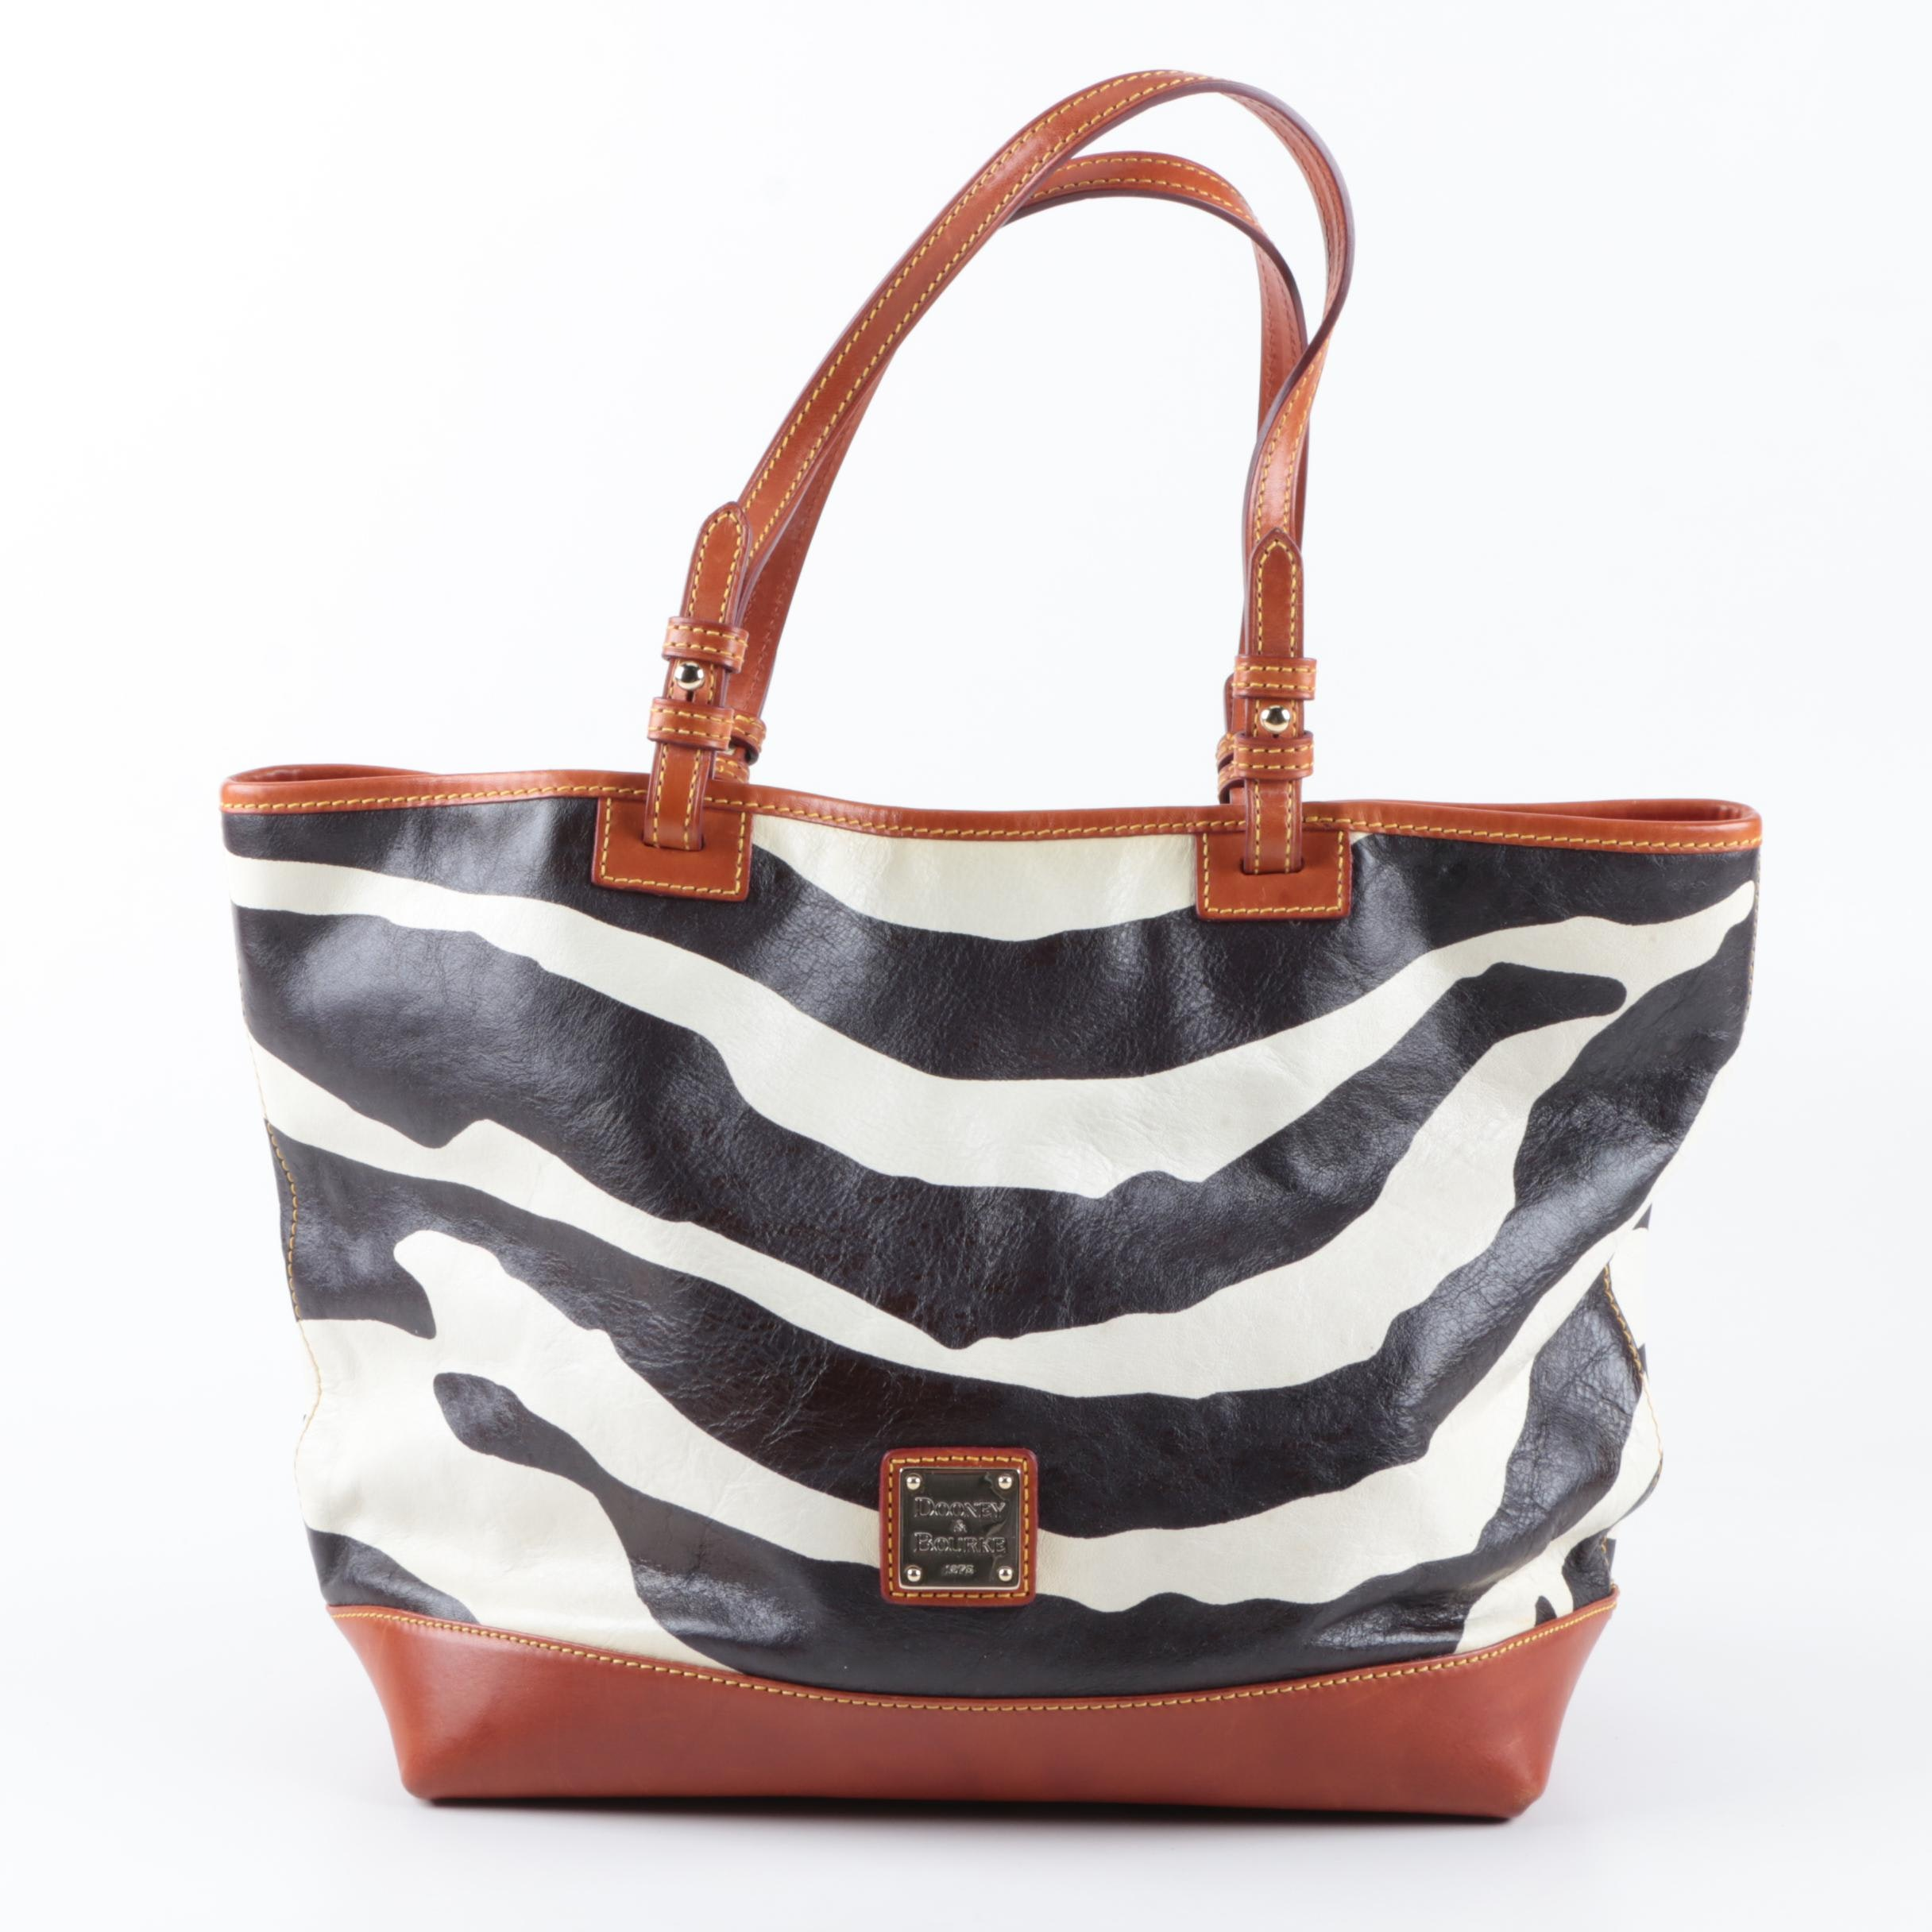 Dooney & Bourke Leather Zebra Print Tote